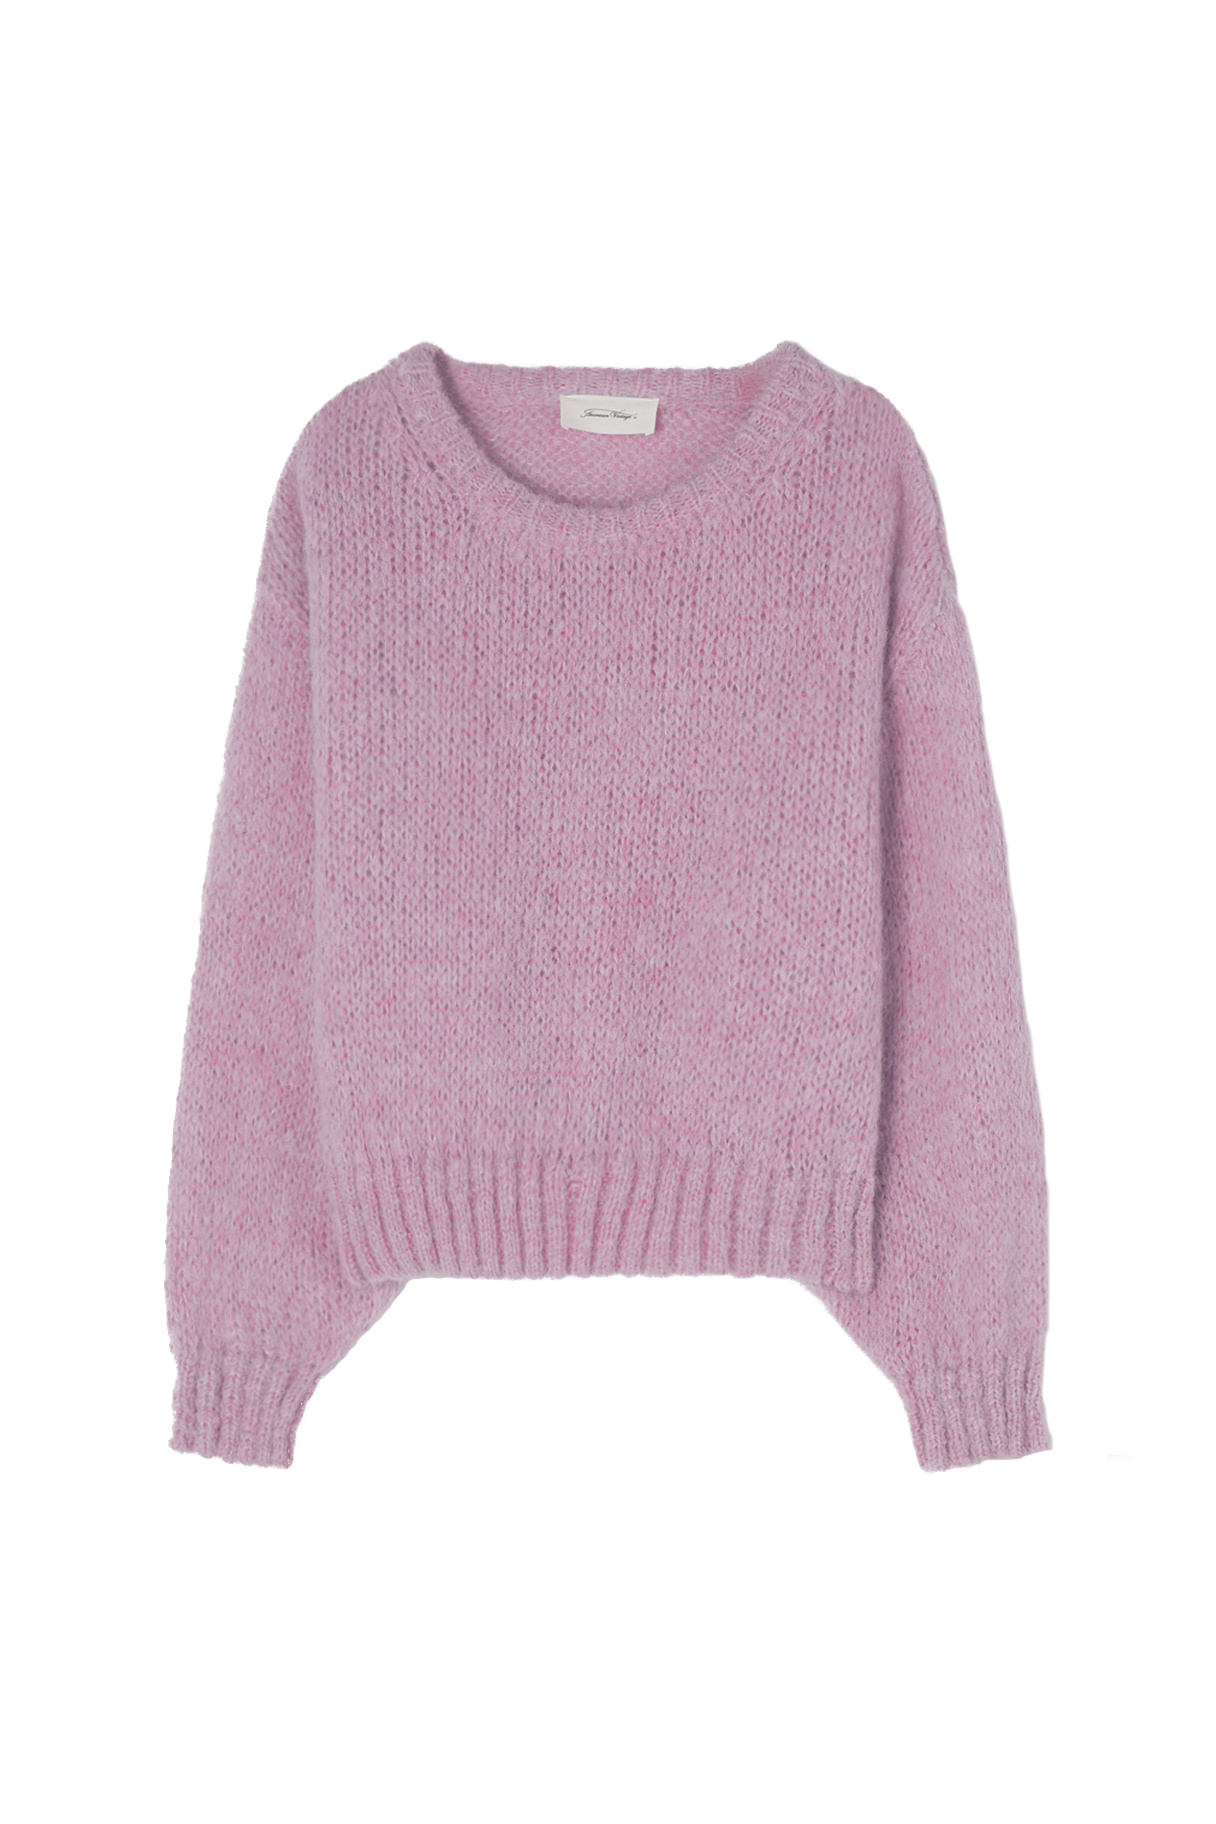 Vogbay Pullover - Prunelle Chine-1